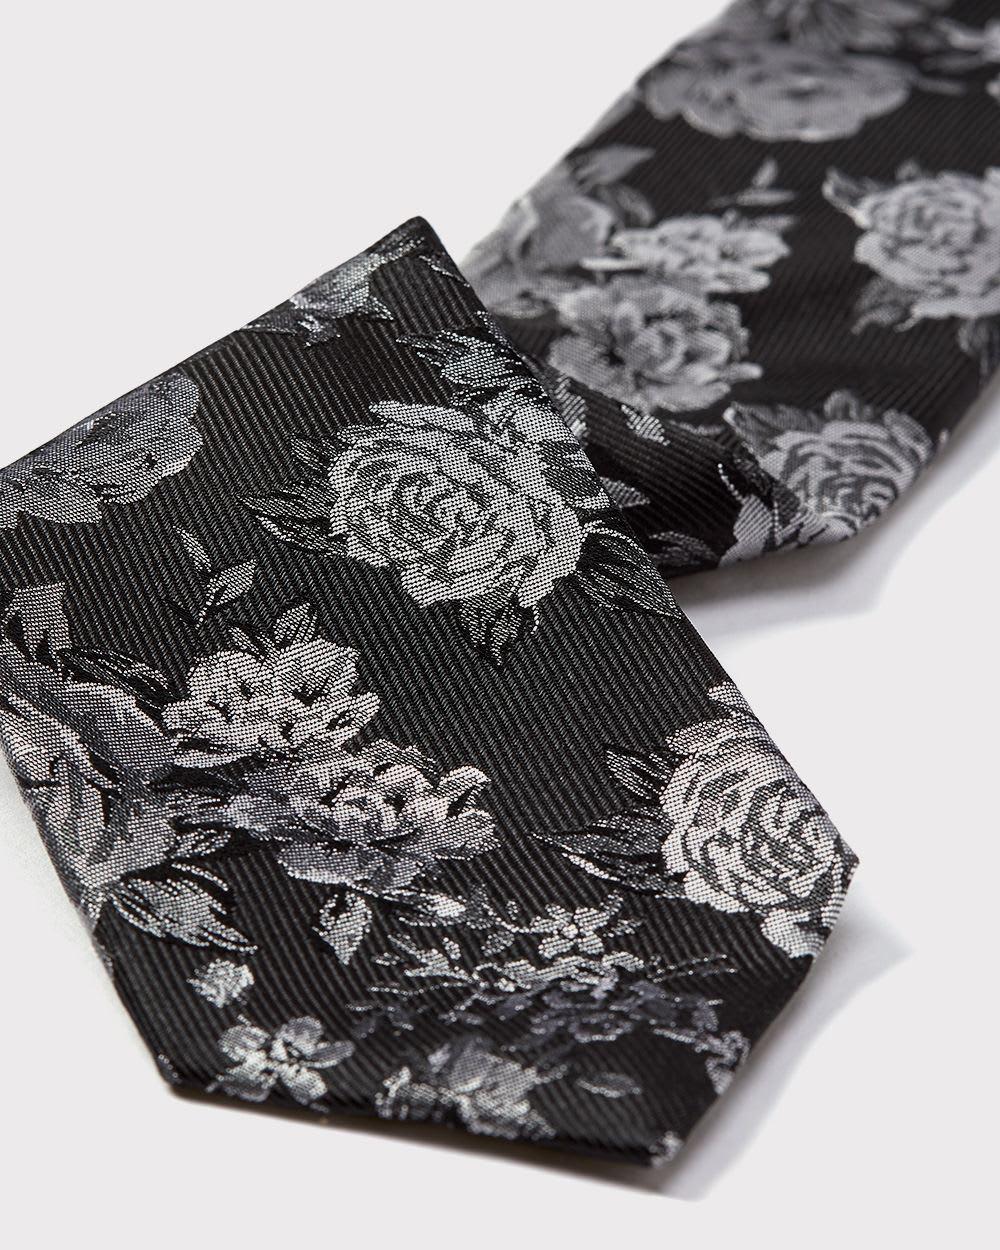 574b9b553b7d Regular black and white floral tie   RW&CO.